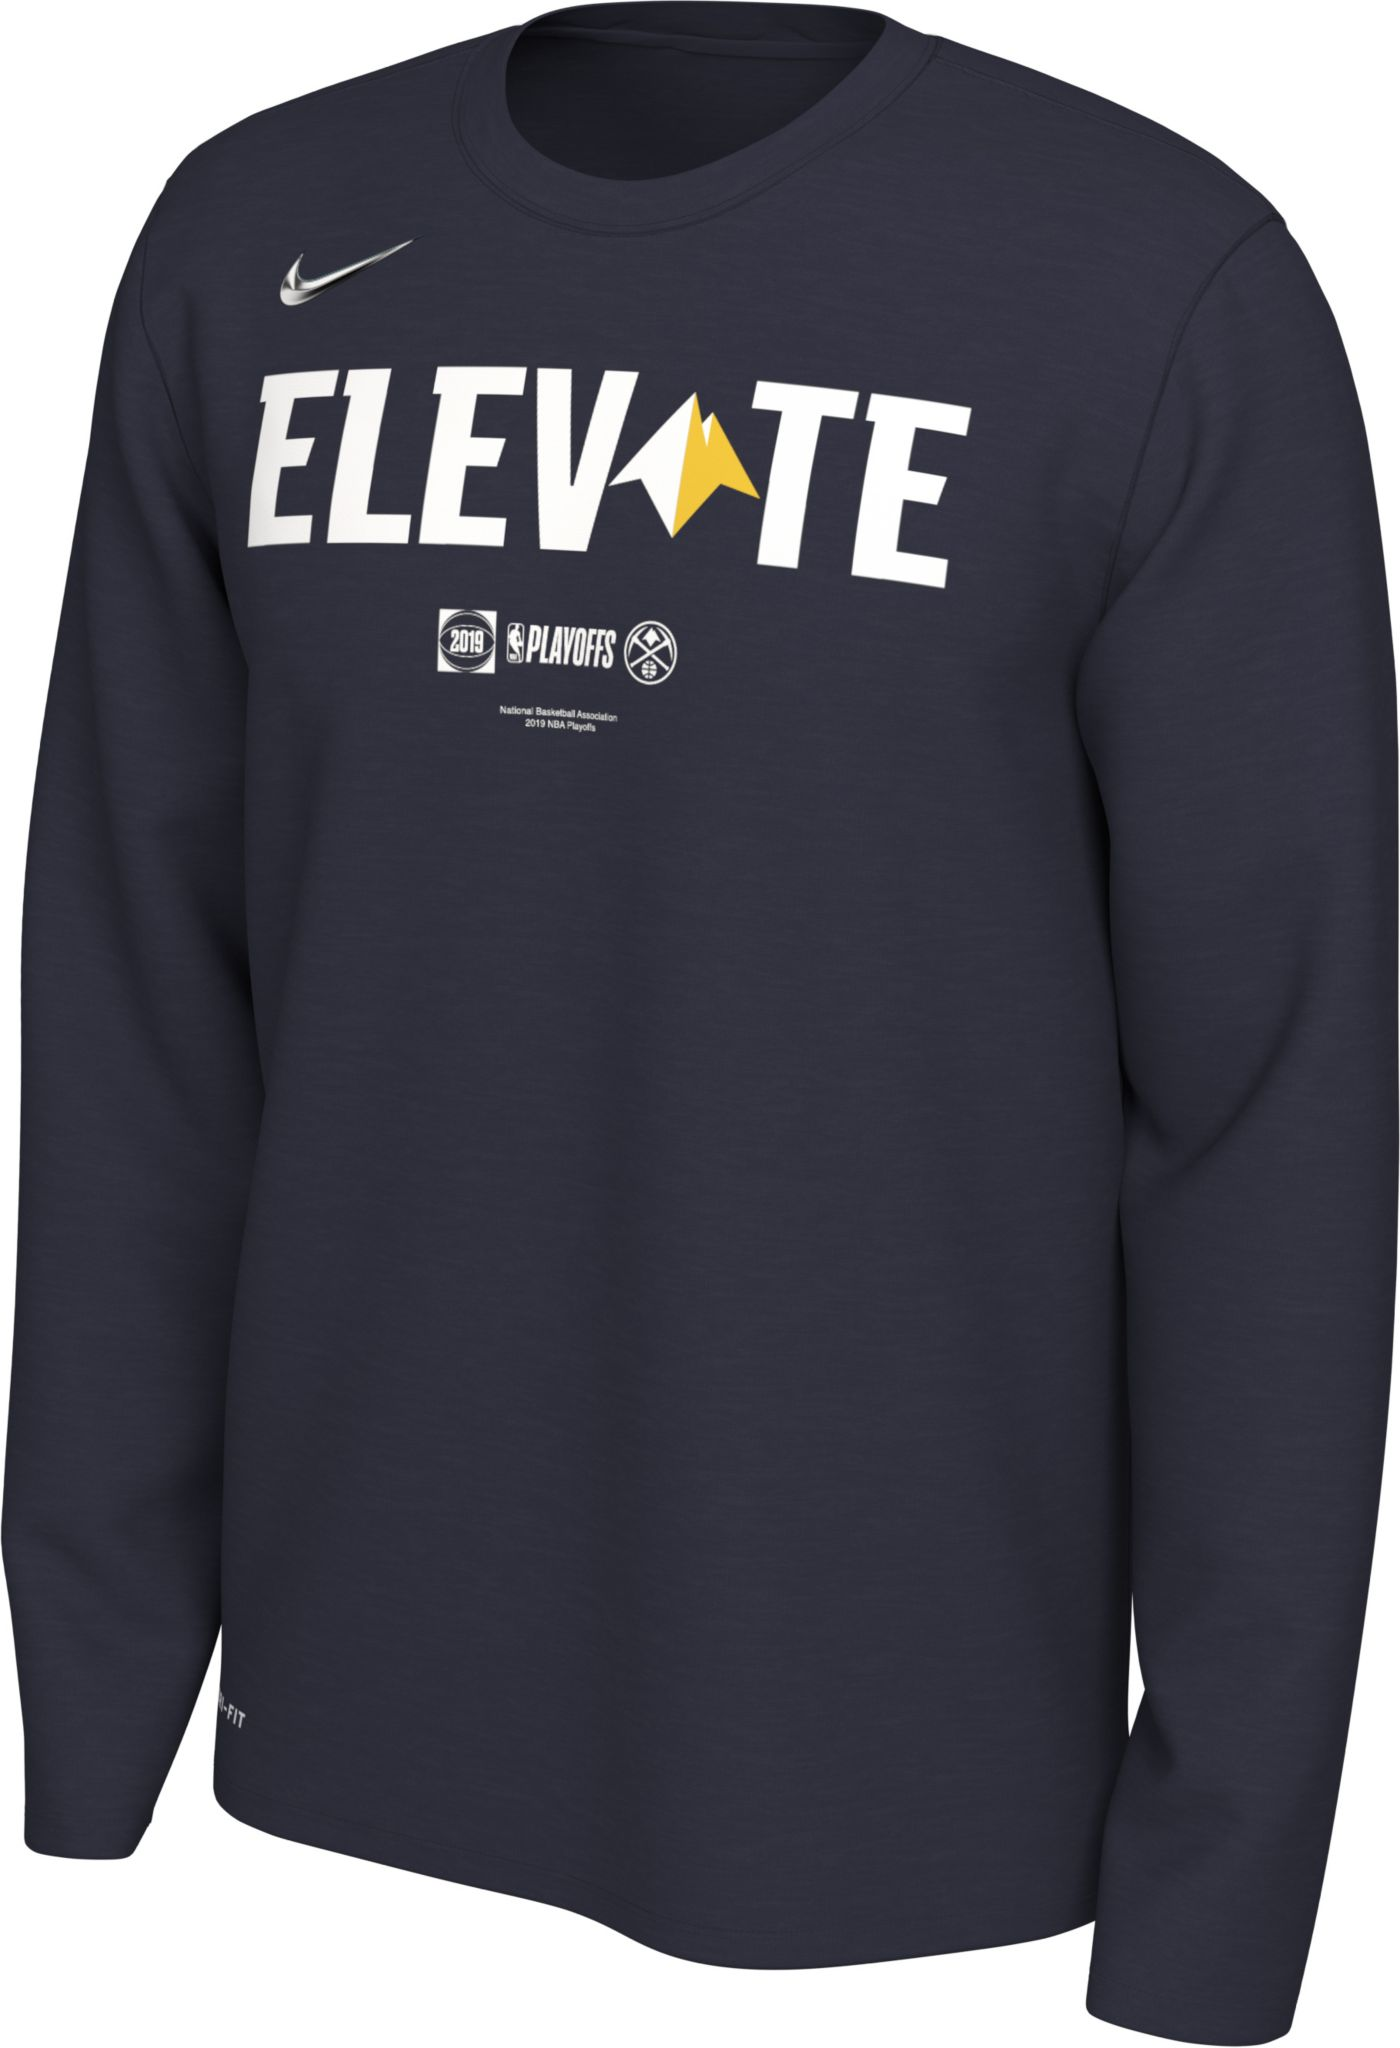 "Nike Men's Denver Nuggets 2019 Playoffs ""Elevate"" Dri-FIT Long Sleeve Shirt"